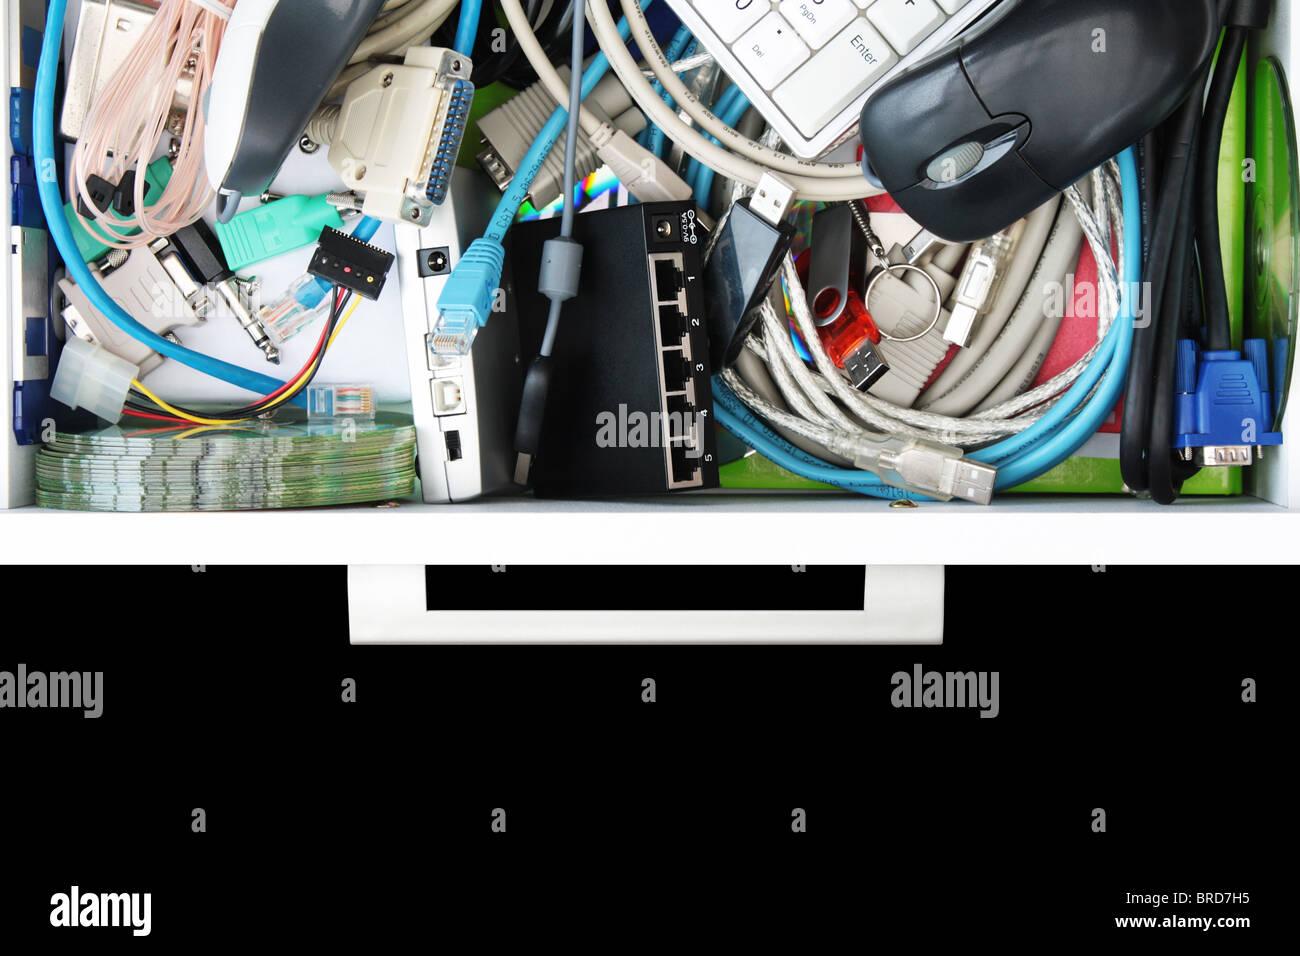 Aperçu de l'intérieur l'ordinateur tiroir Stuff Photo Stock